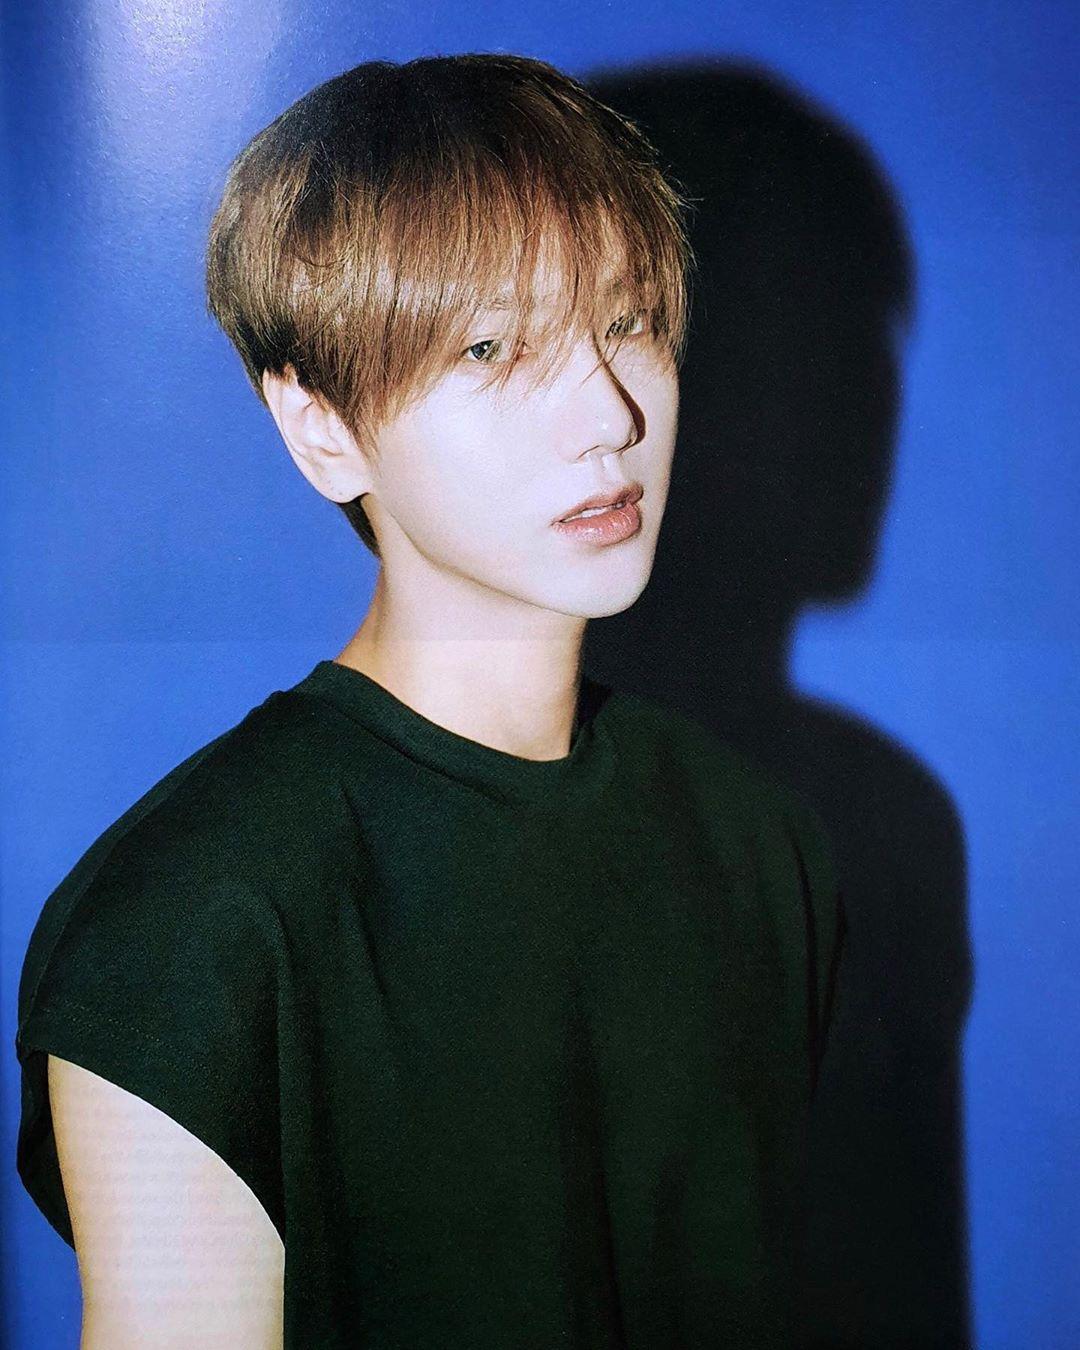 Yesung South Korean Singer, Song Writer, Actor